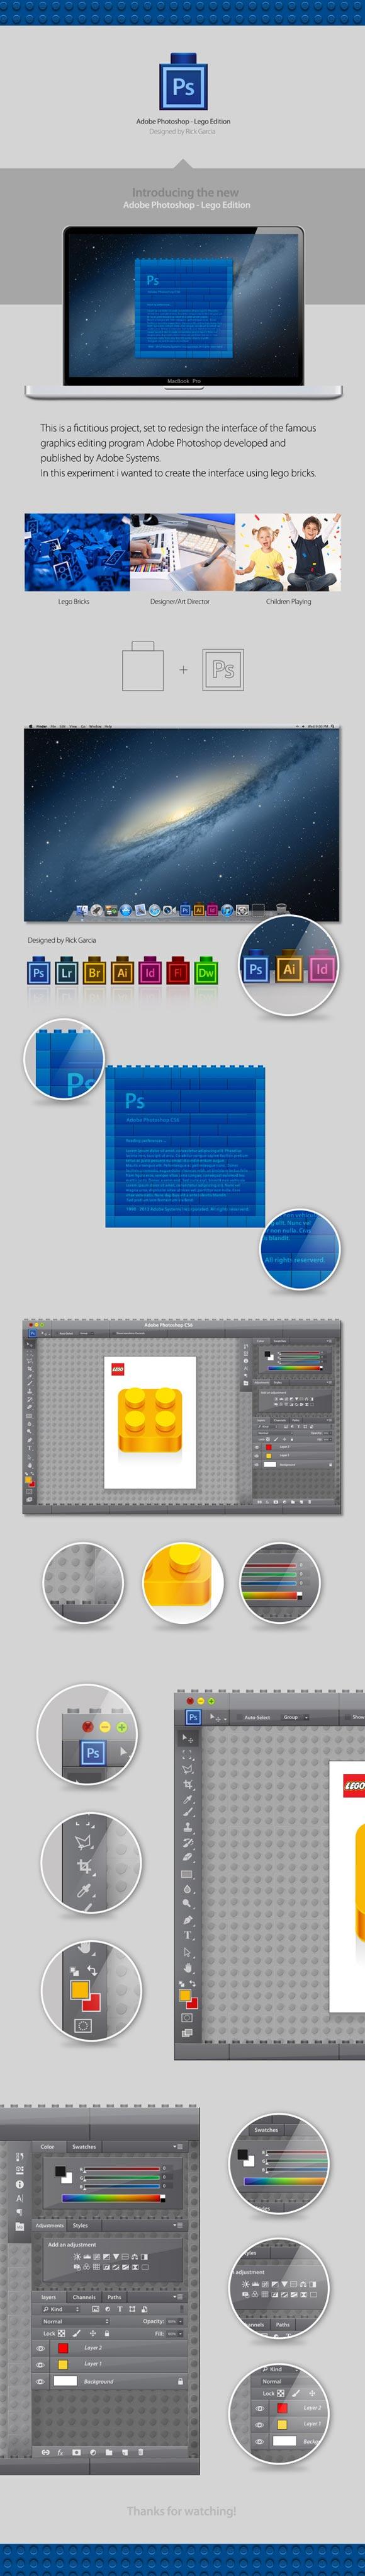 Rick García - Interfaz de Photoshop en versión Lego